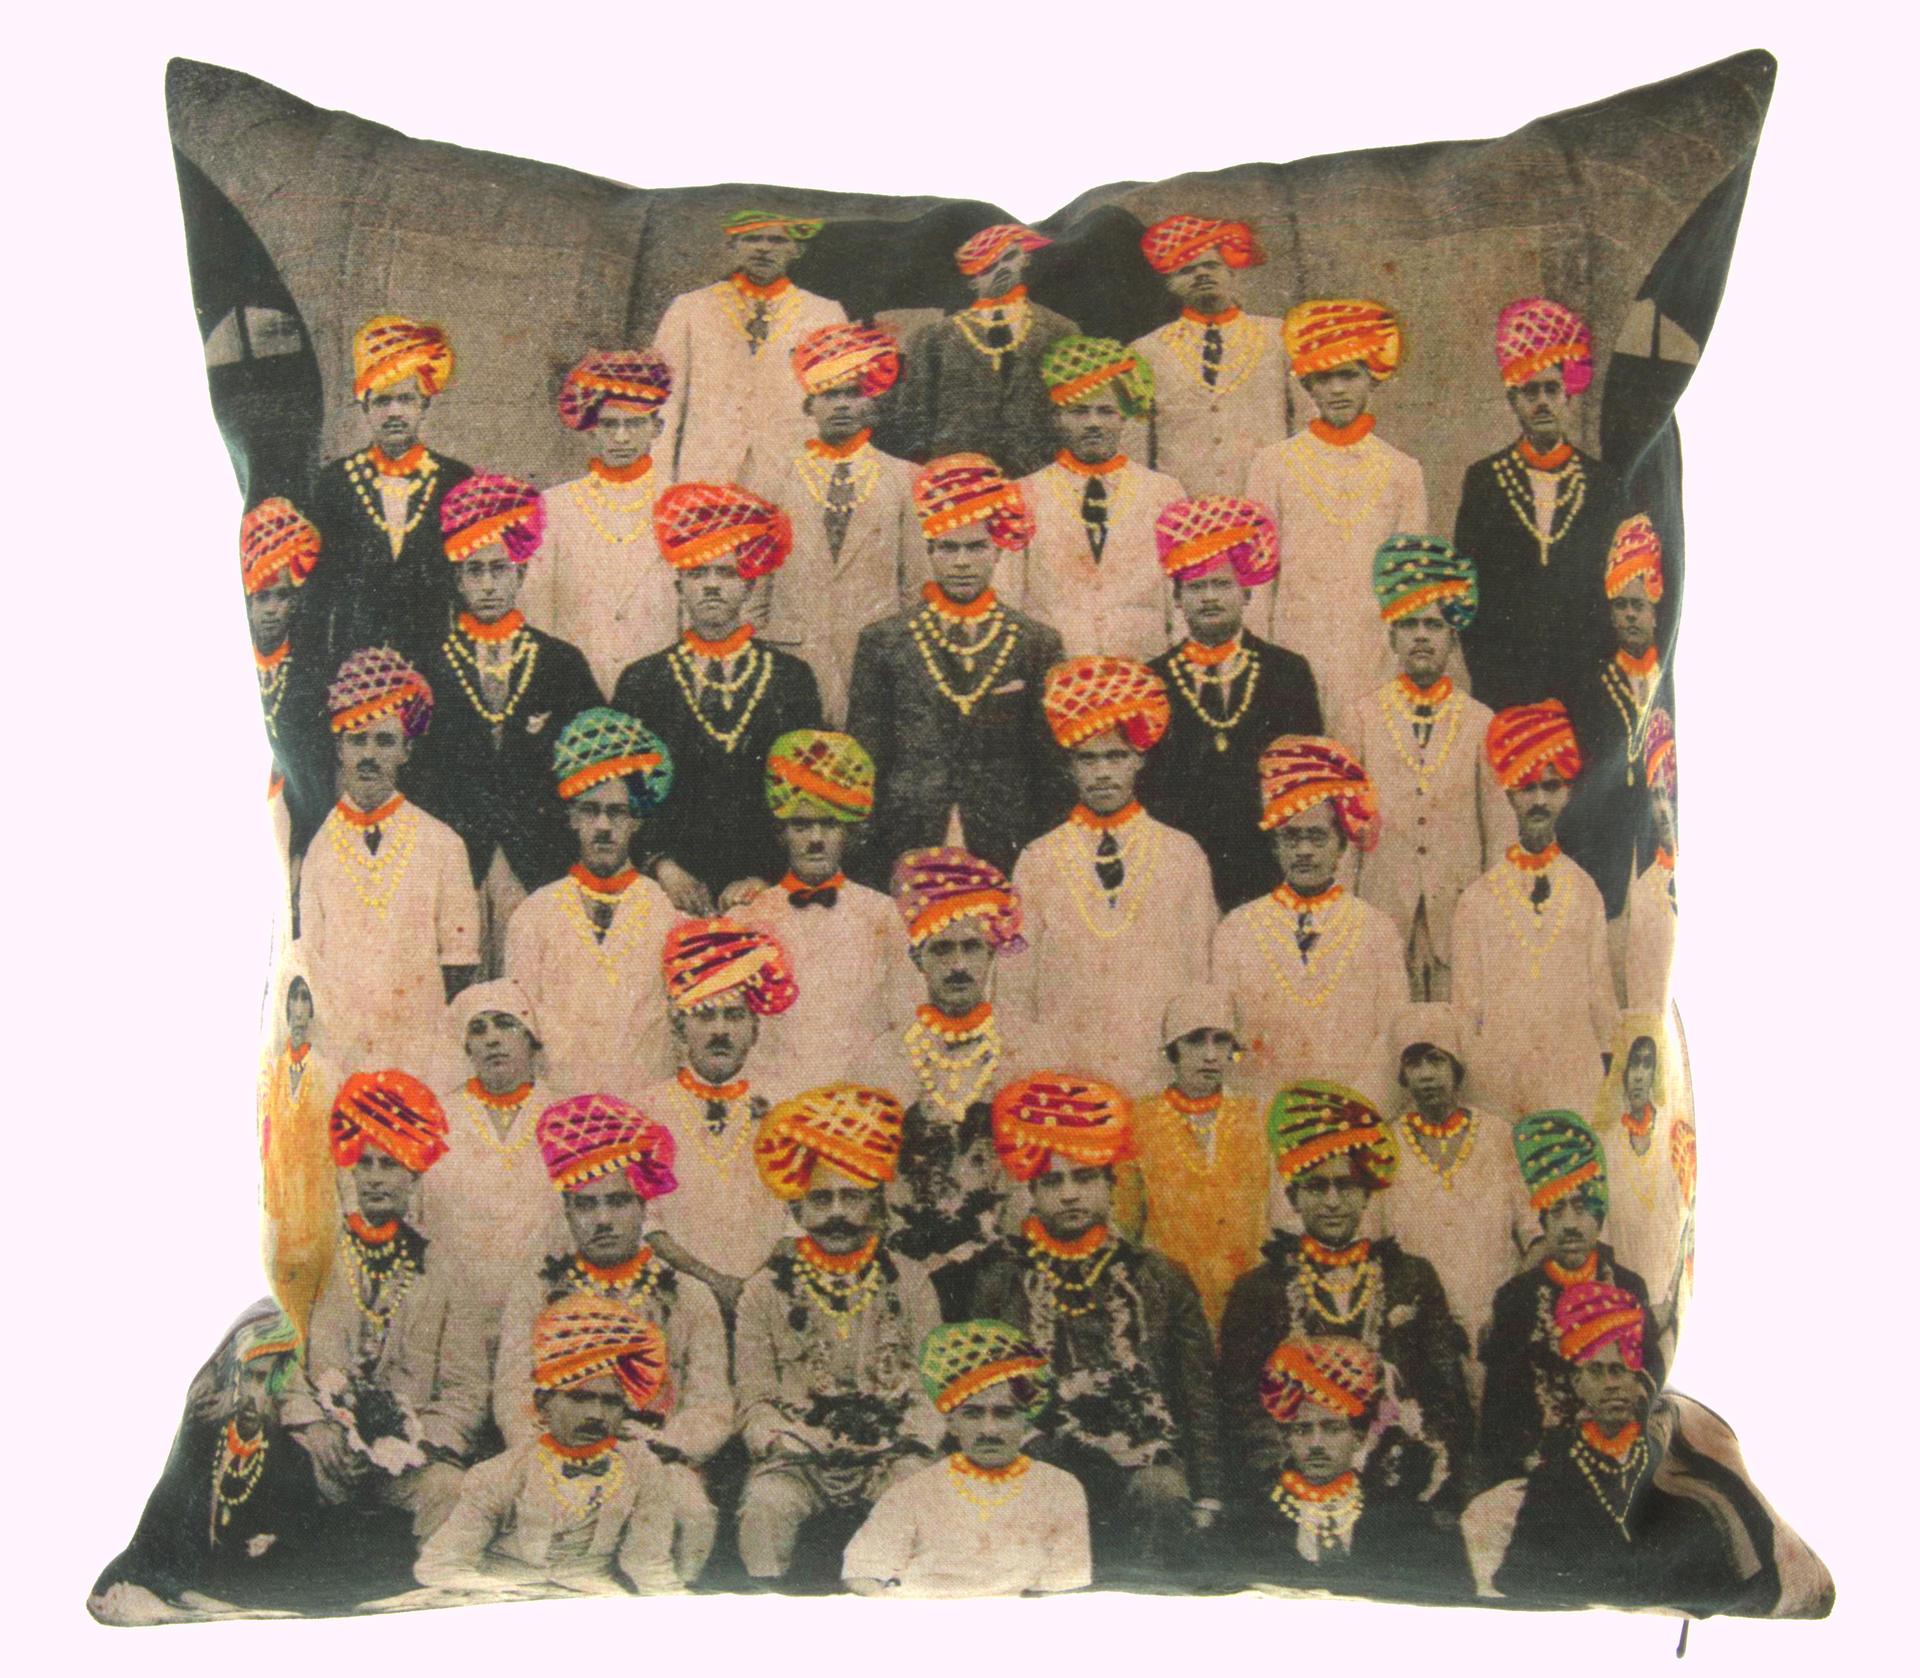 Neeru Kumar cushion cover with colourful turbans